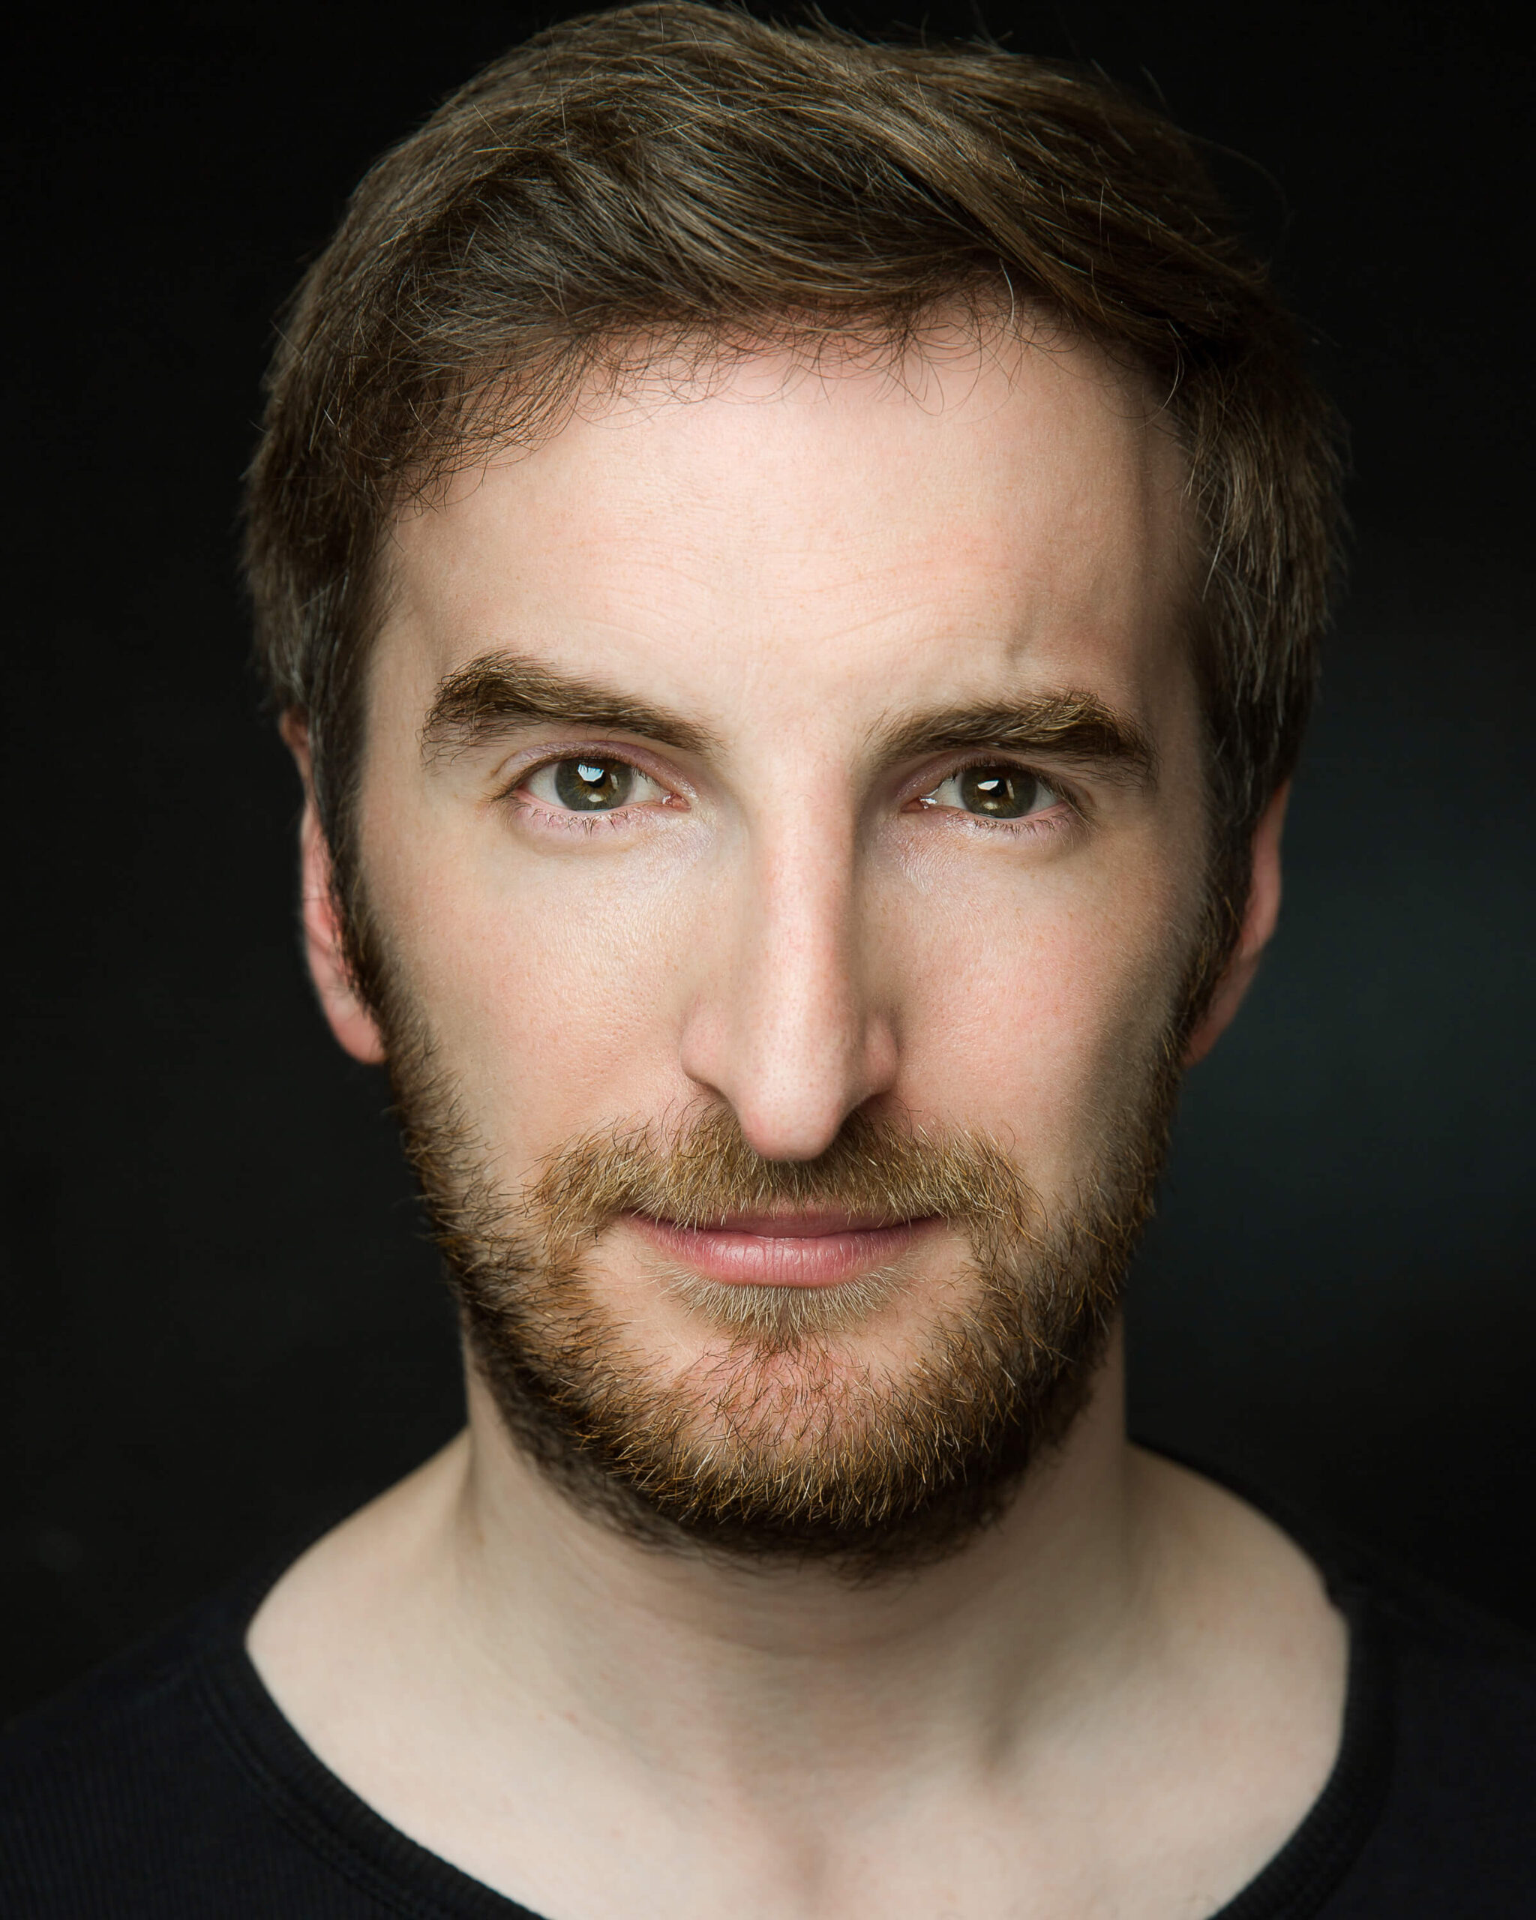 Gareth Turkington